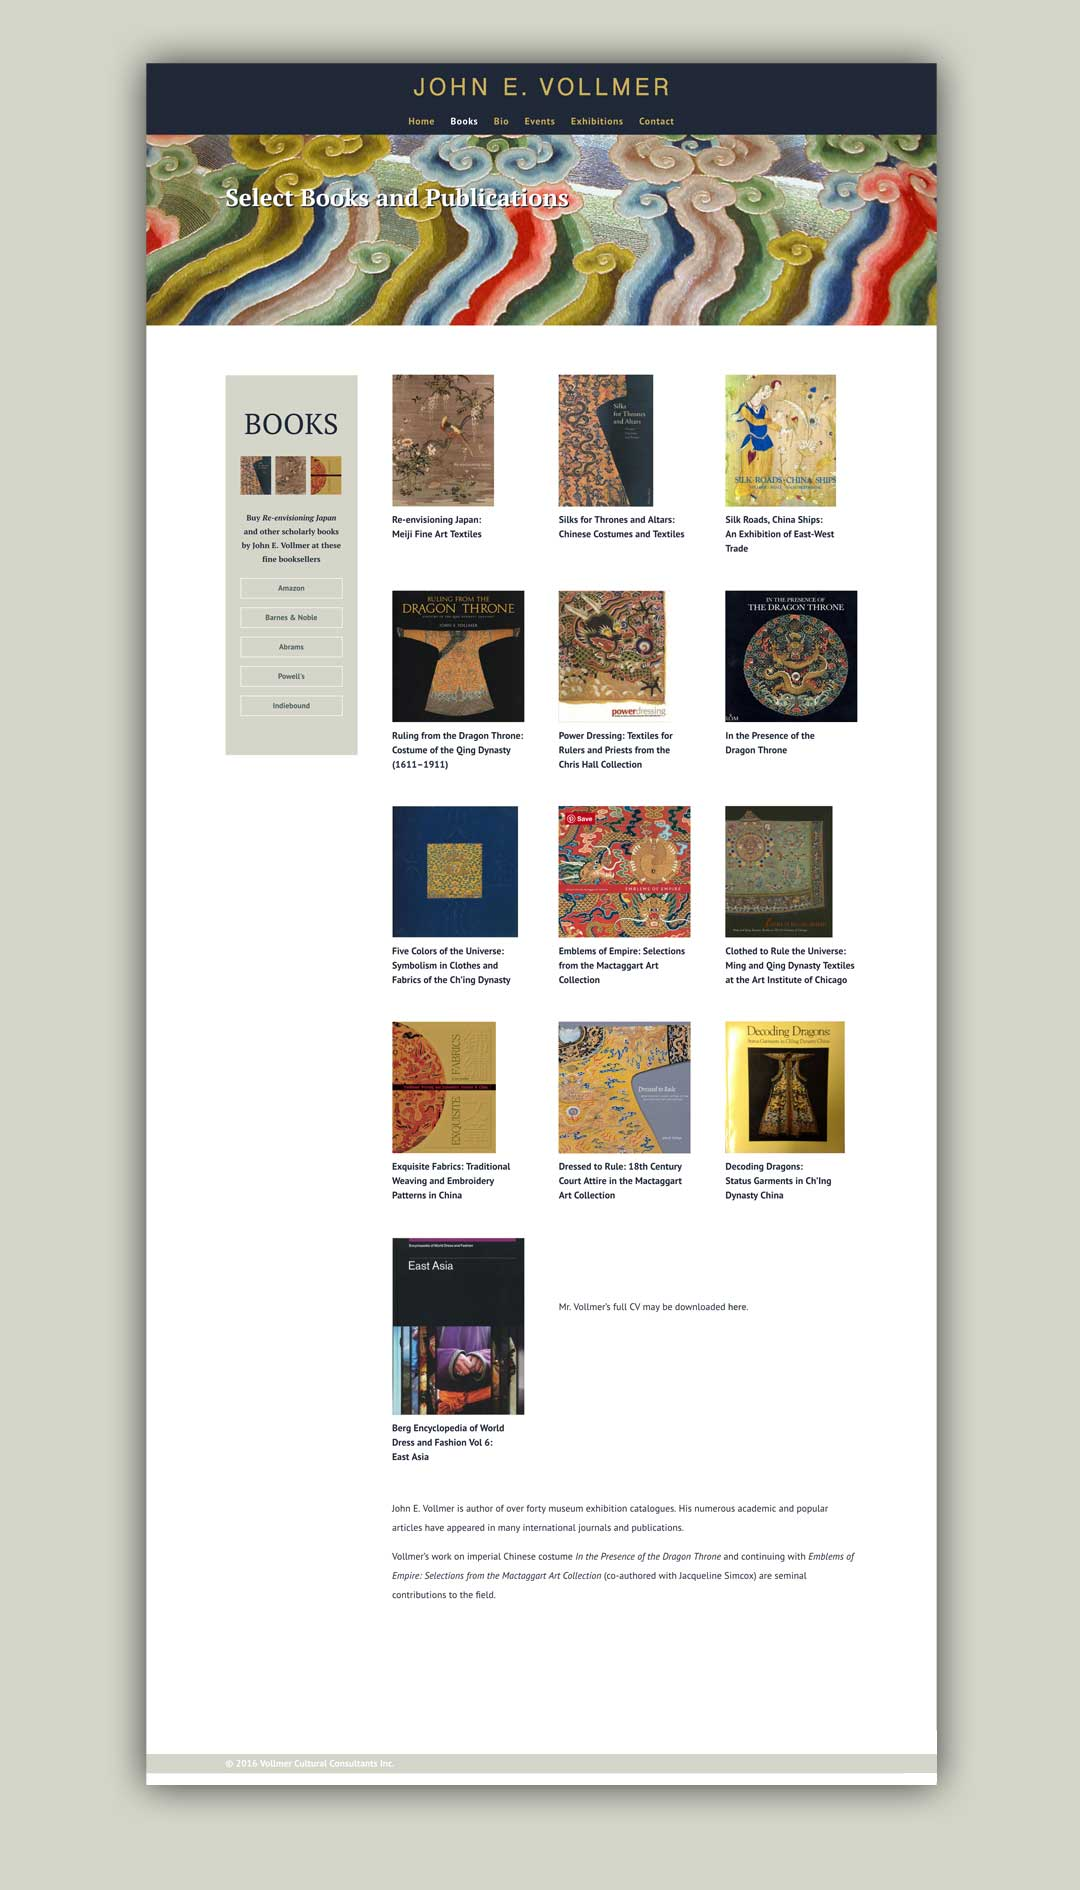 John Vollmer books portfolio page sample